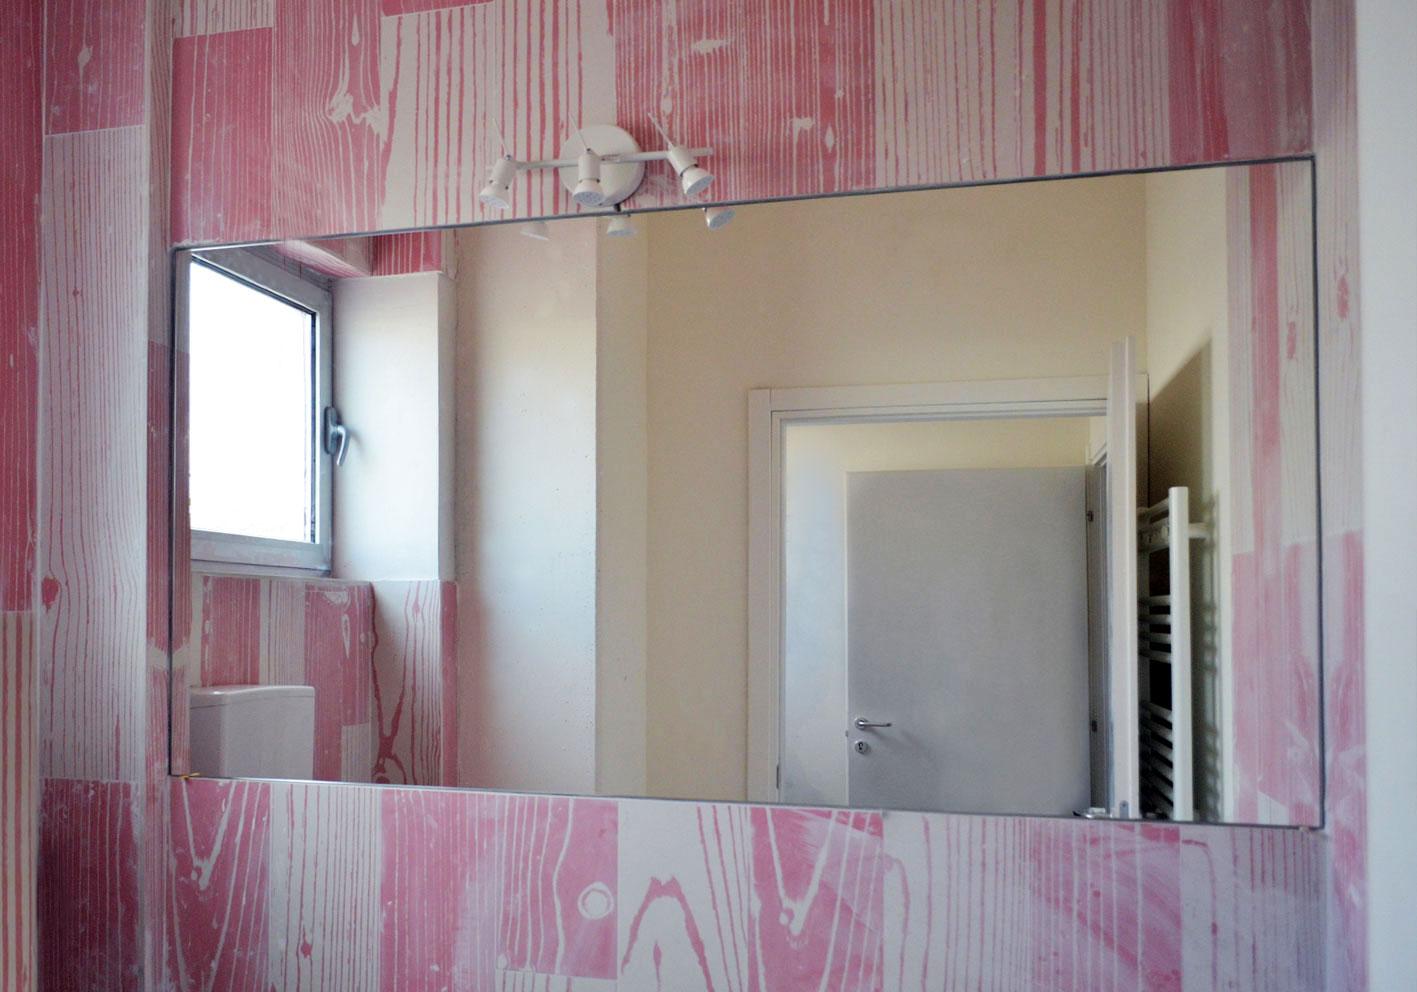 Specchio pe bagno